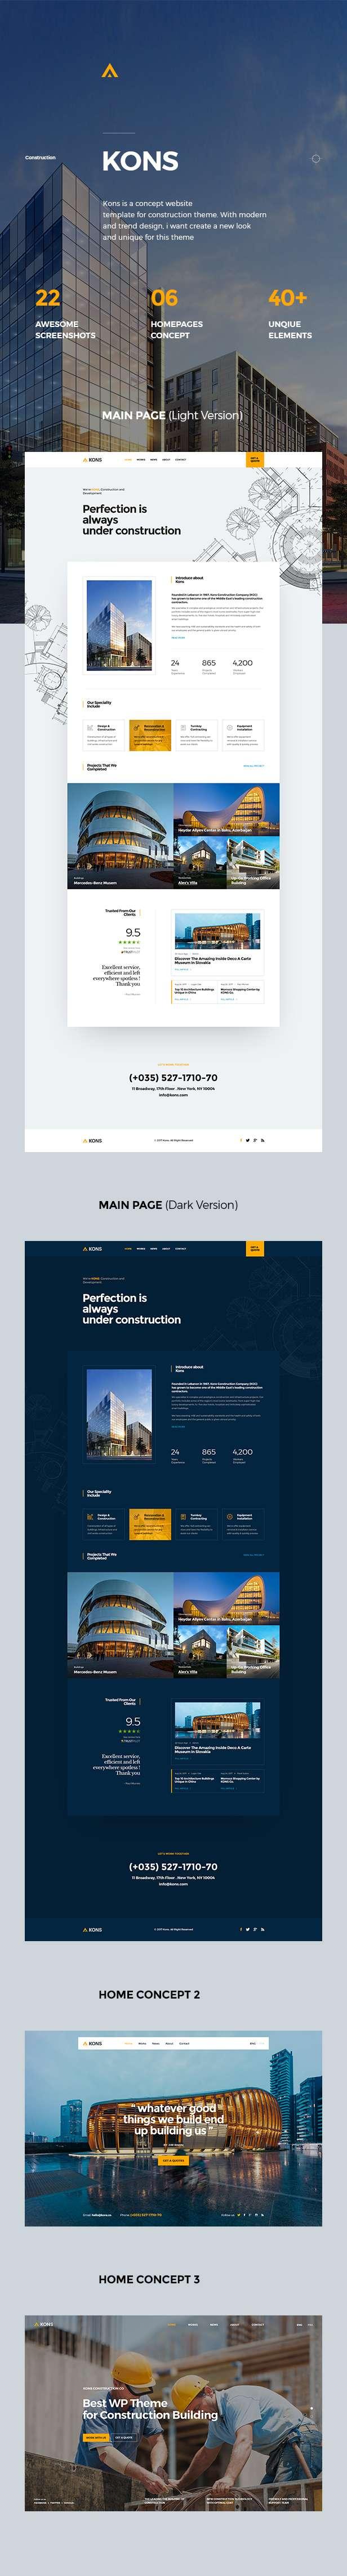 Kons ! Construction PSD Template - 6